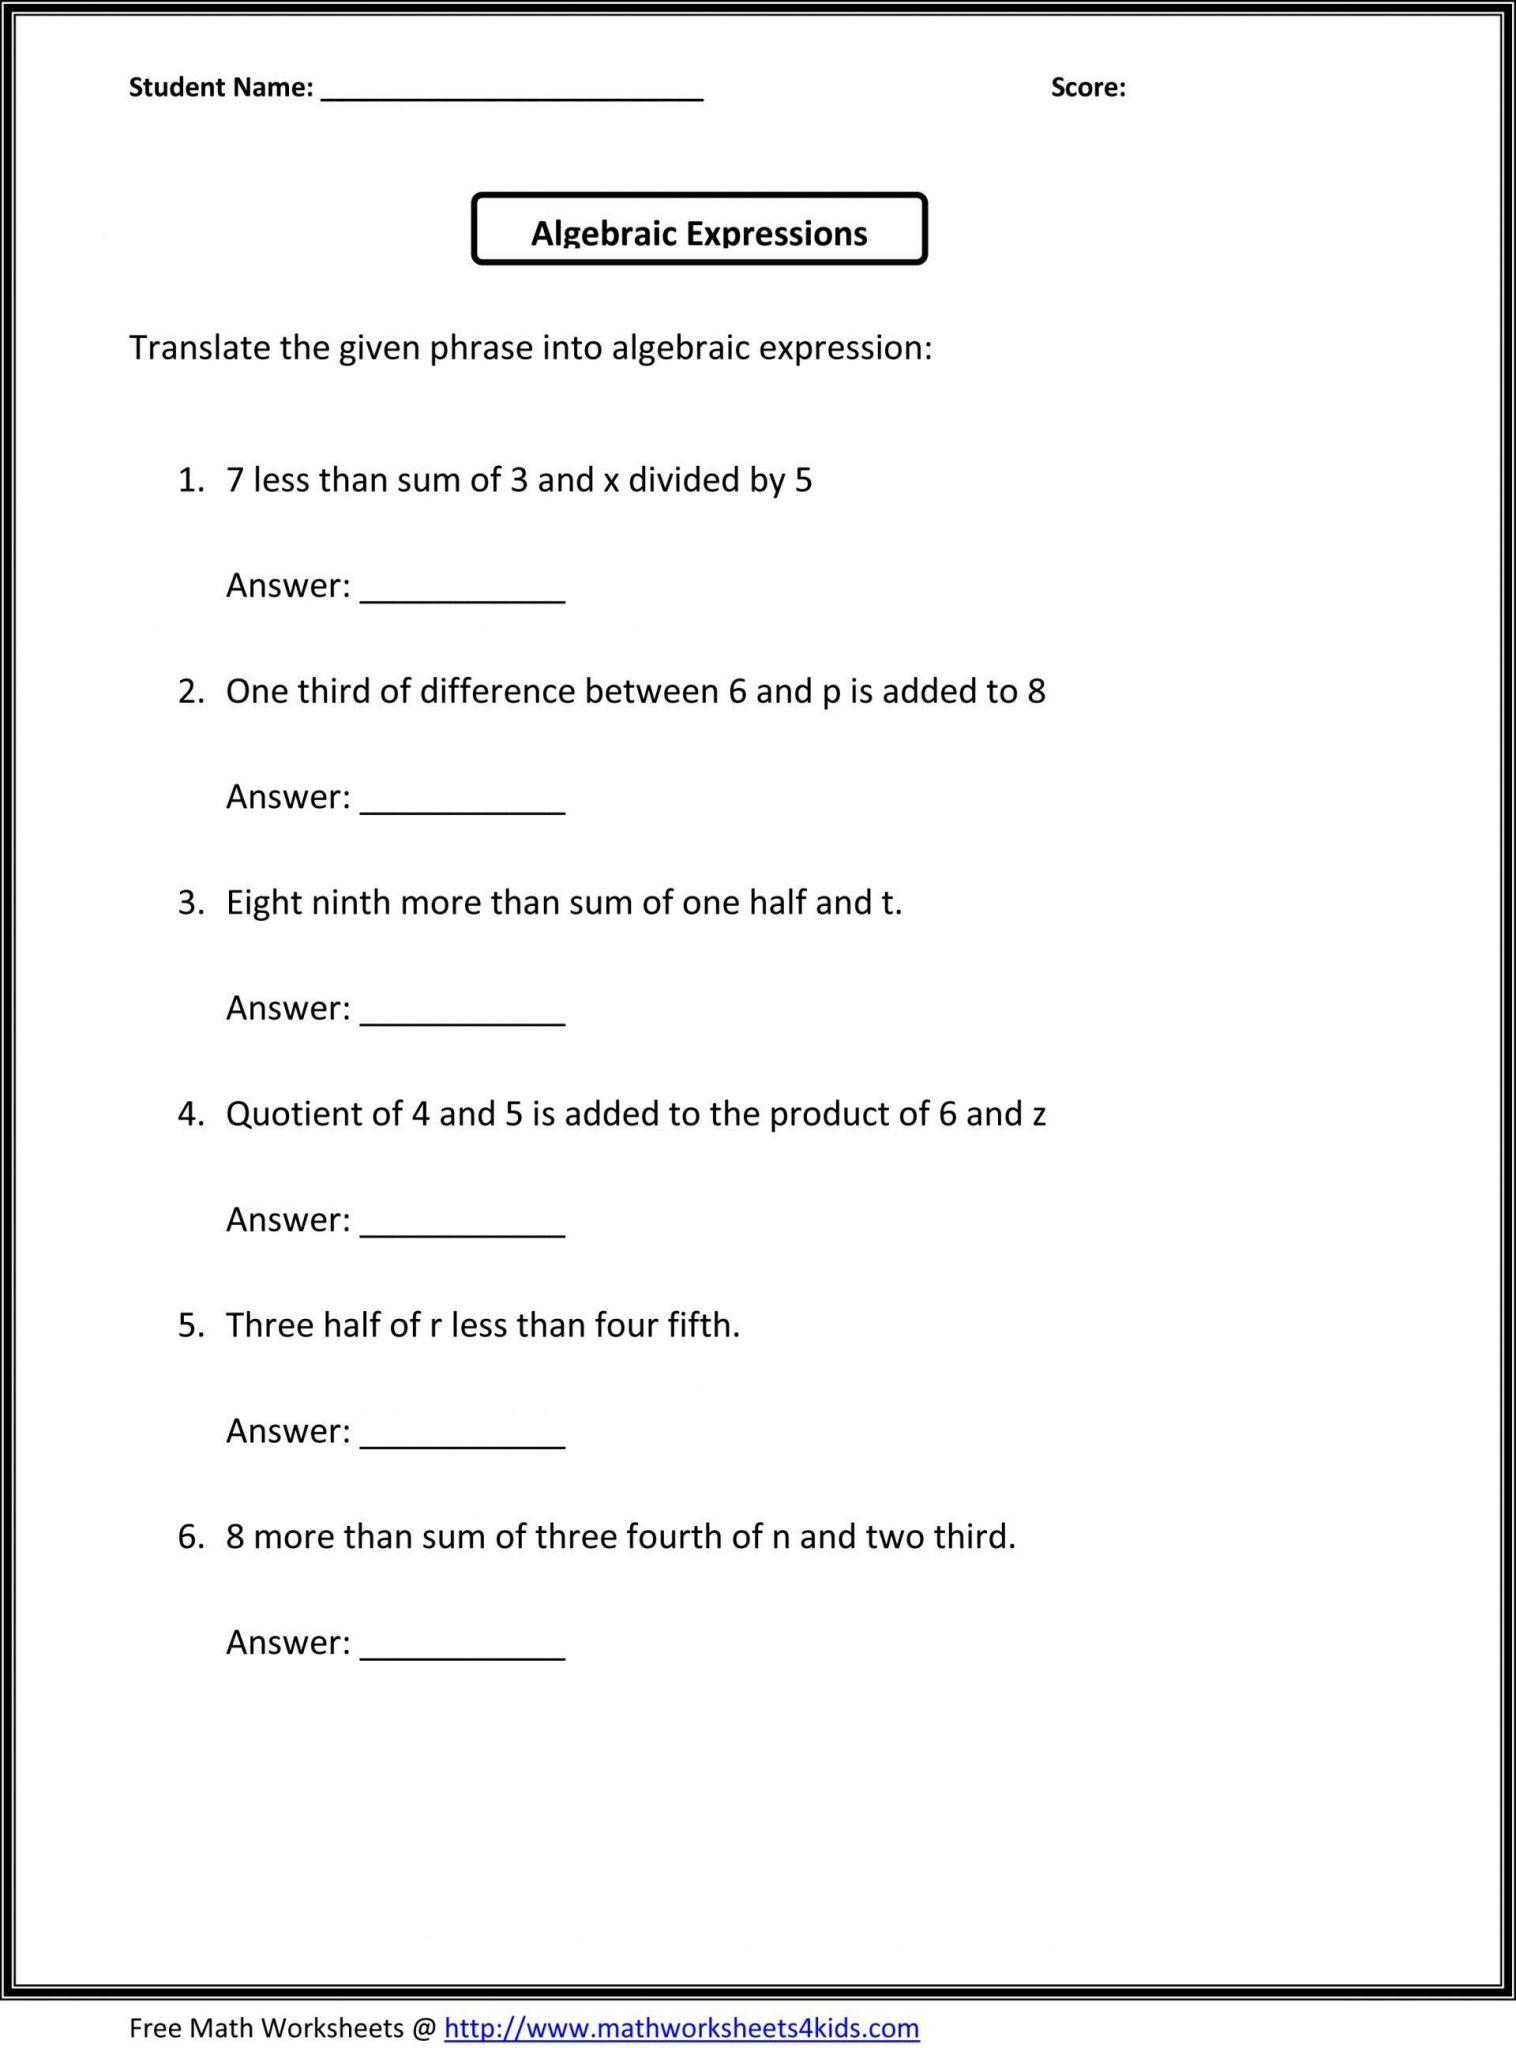 30 Evaluating Variable Expressions Worksheet